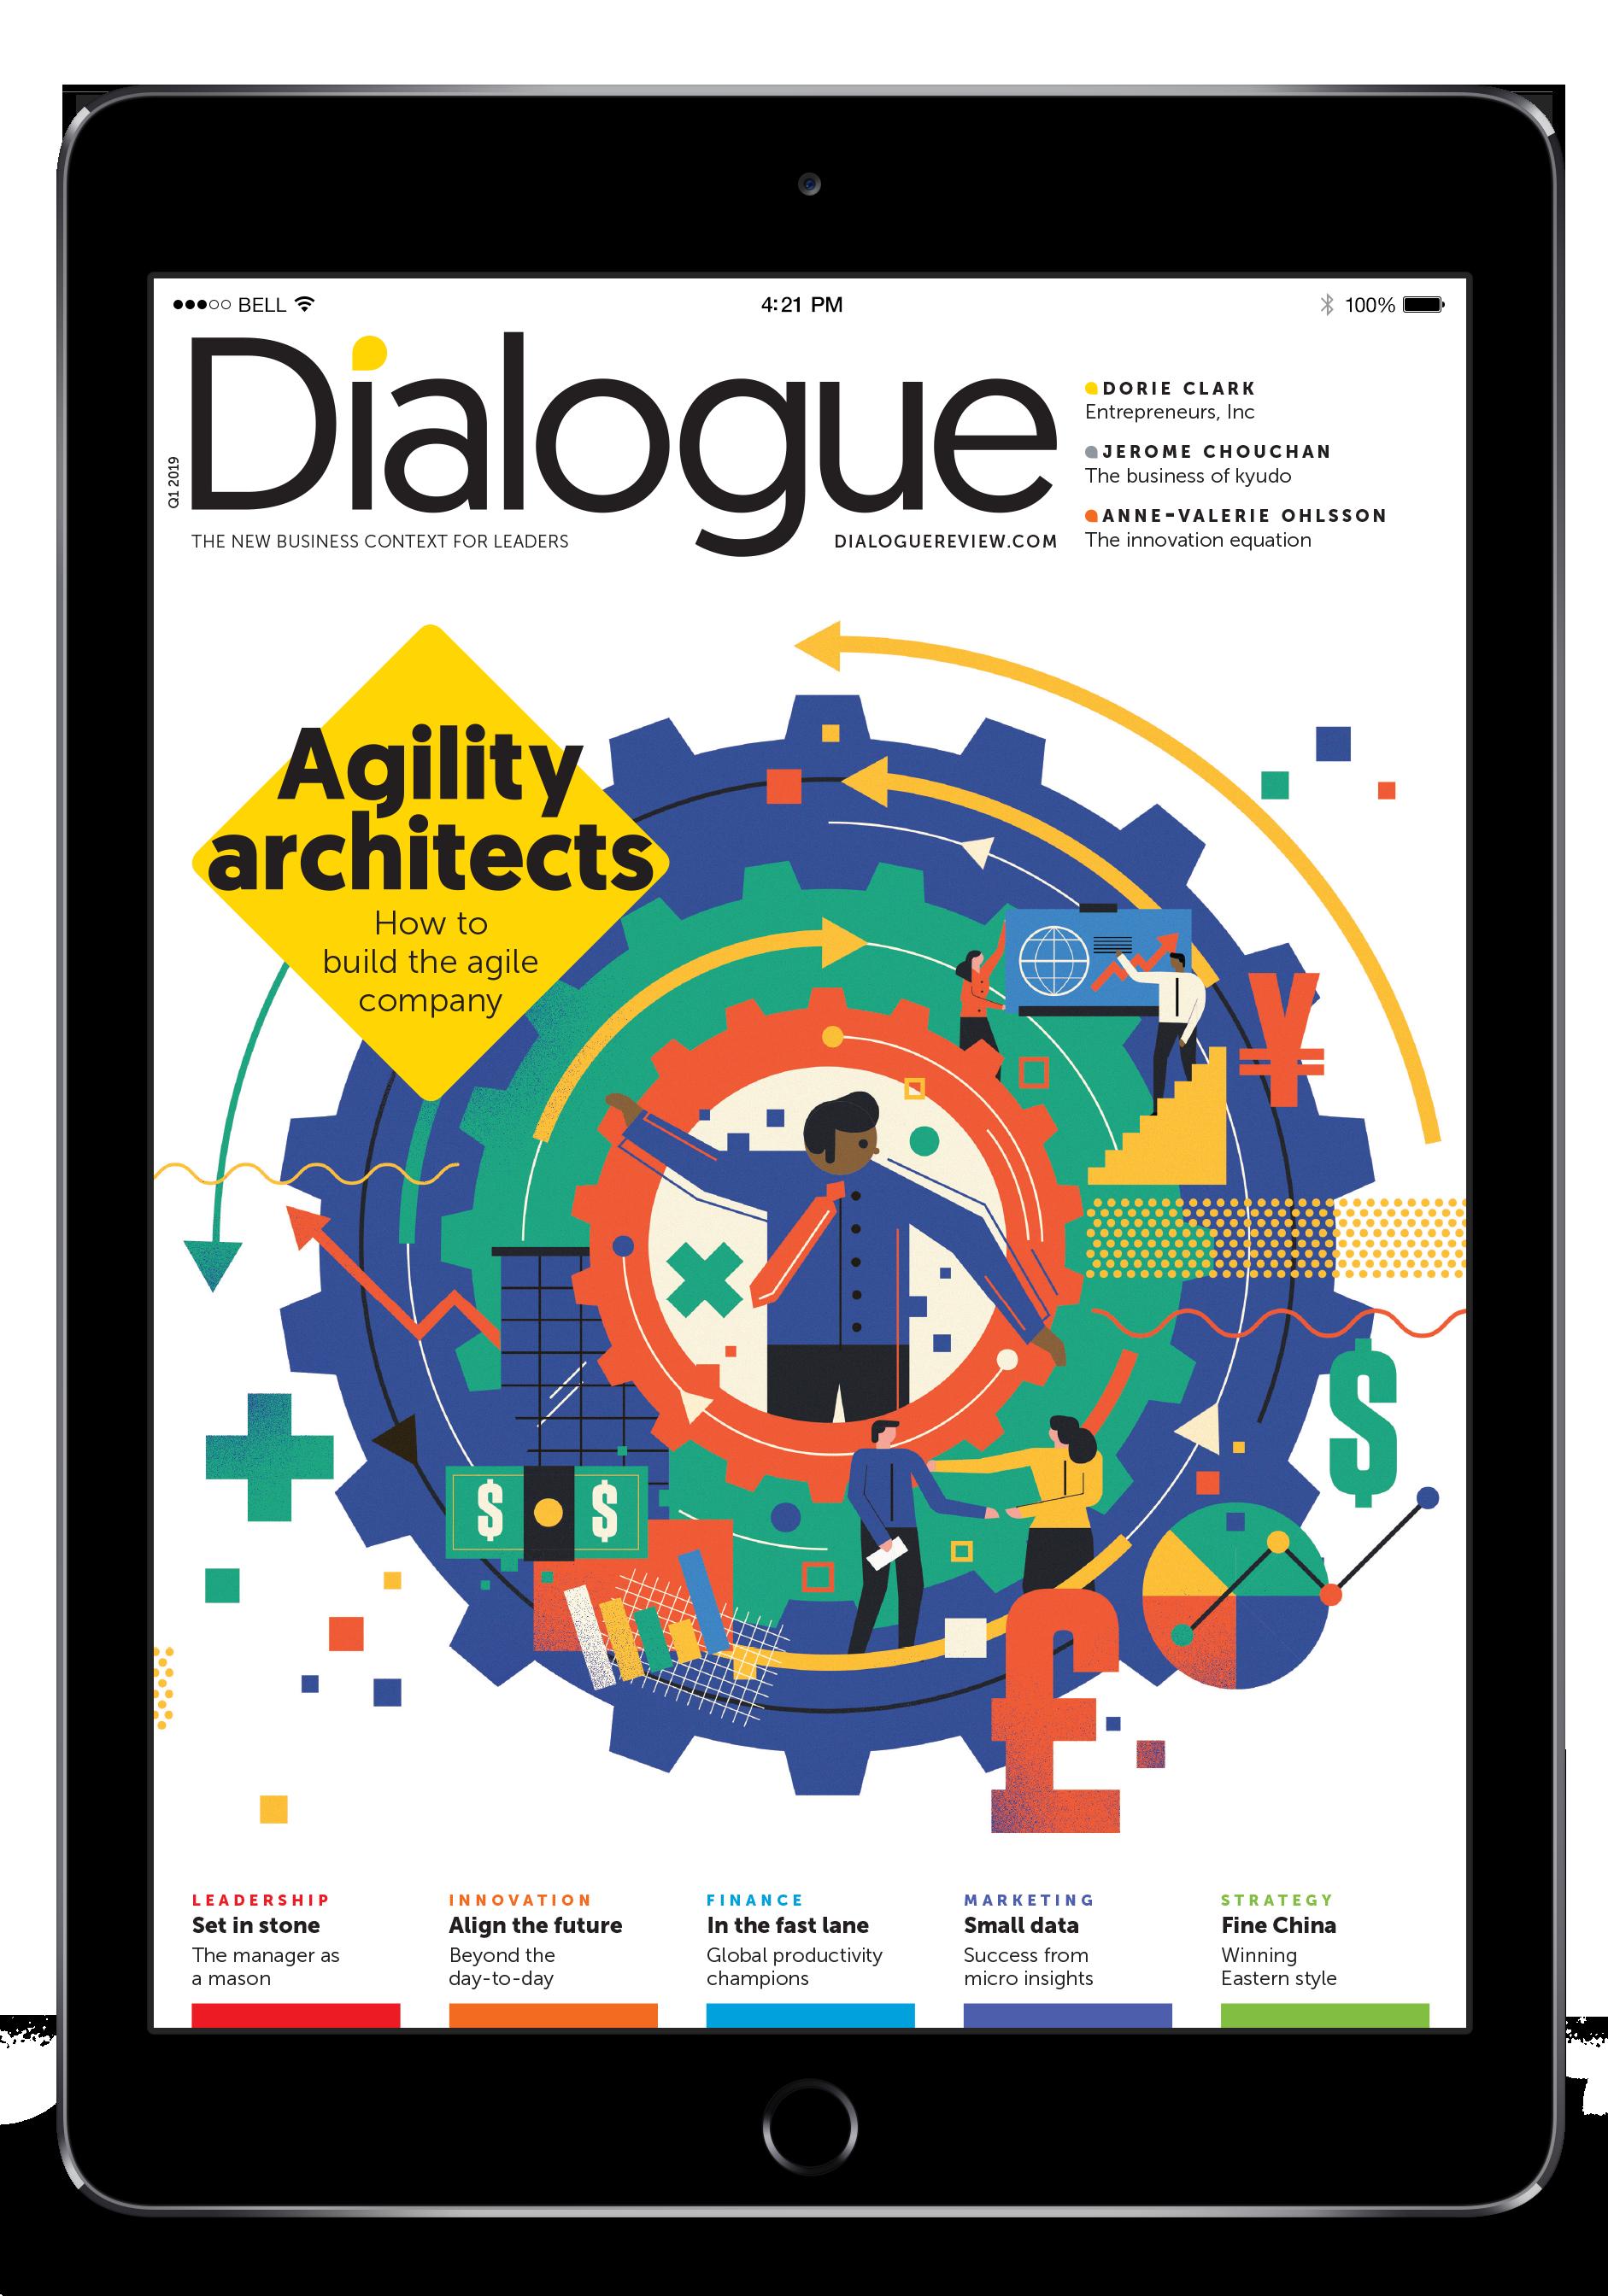 Home Duke Corporate Education Leadership For Whats Next Electronicsprojectsinpunejpg Dialogue